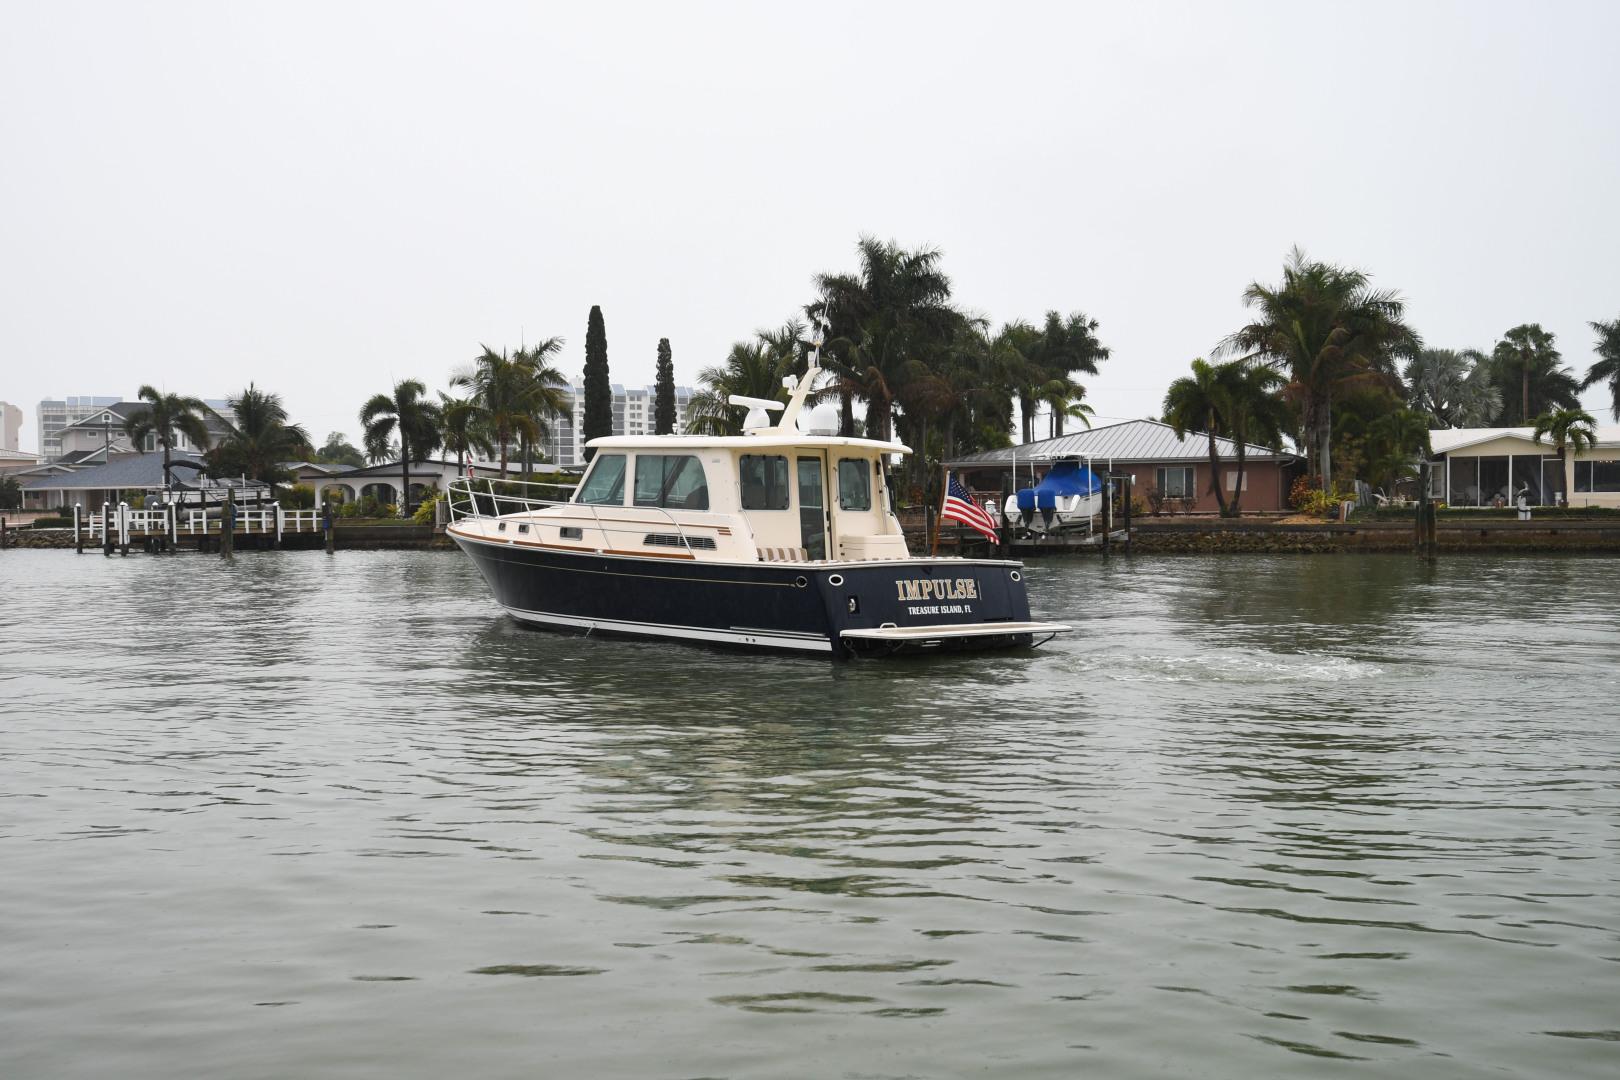 Sabre-40 Express 2010-Impulse Treasure Island-Florida-United States-2010 40 Sabre Express  Impulse  Profile-1618653 | Thumbnail